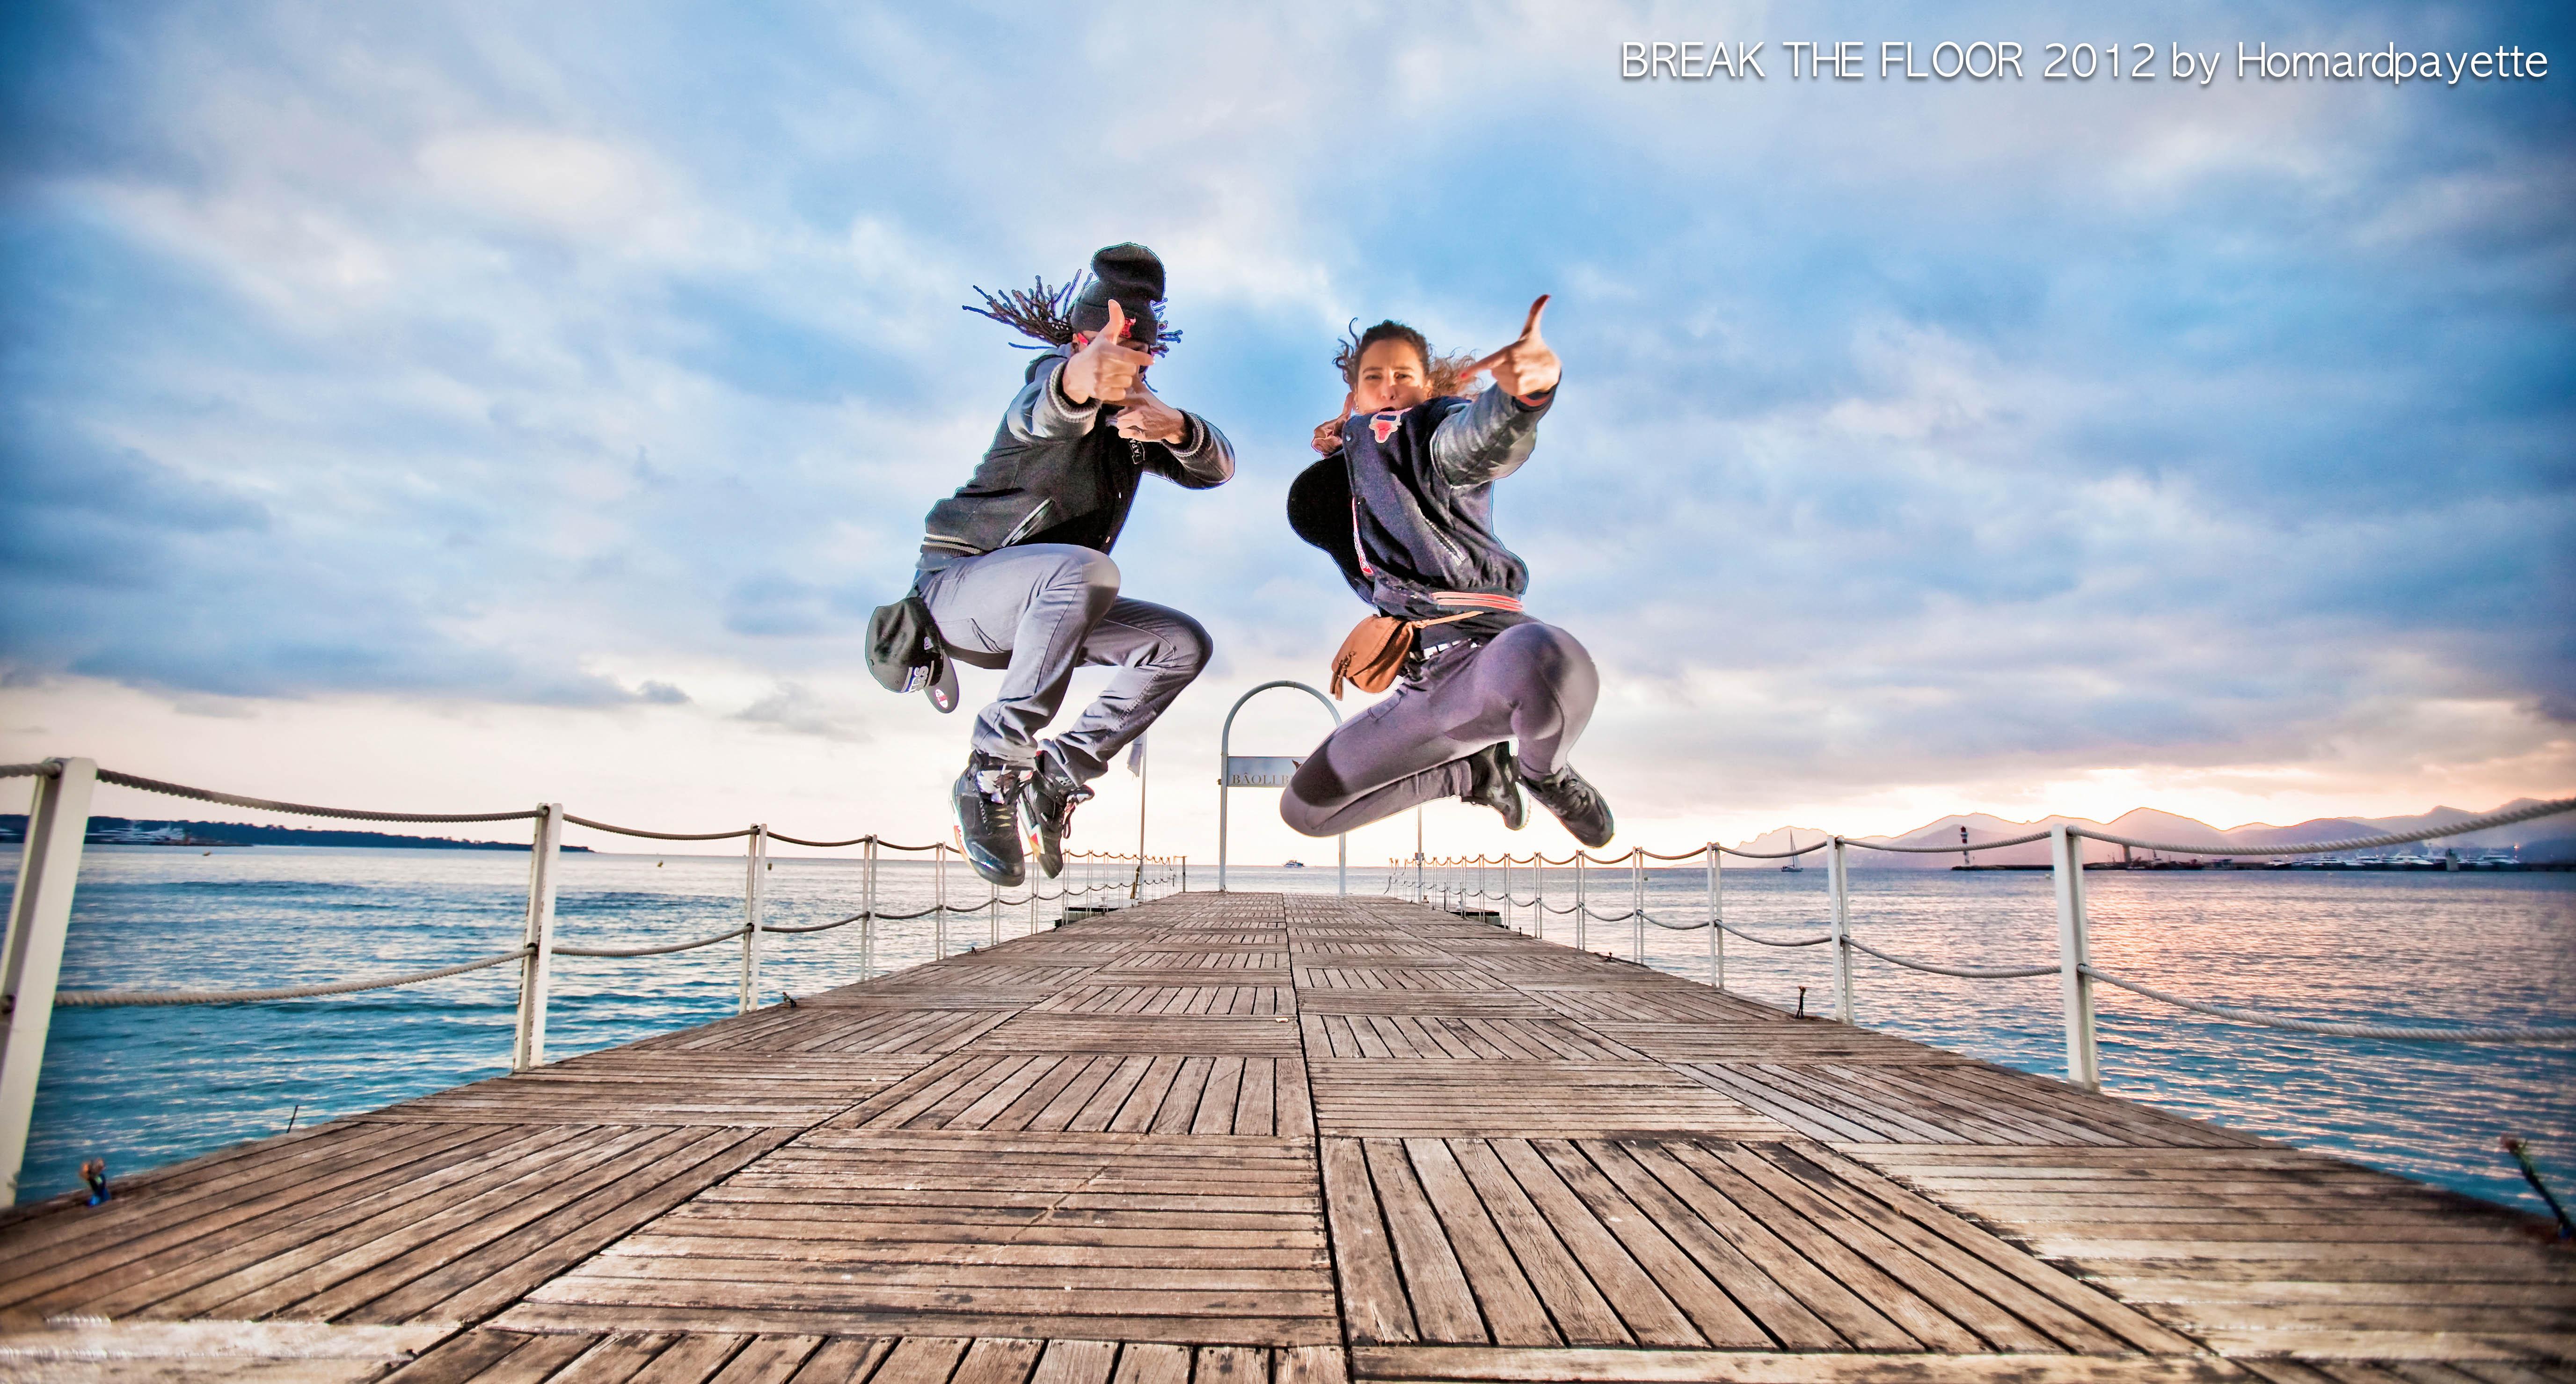 Break the Floor 2012 by Homardpayette (82 sur 531)